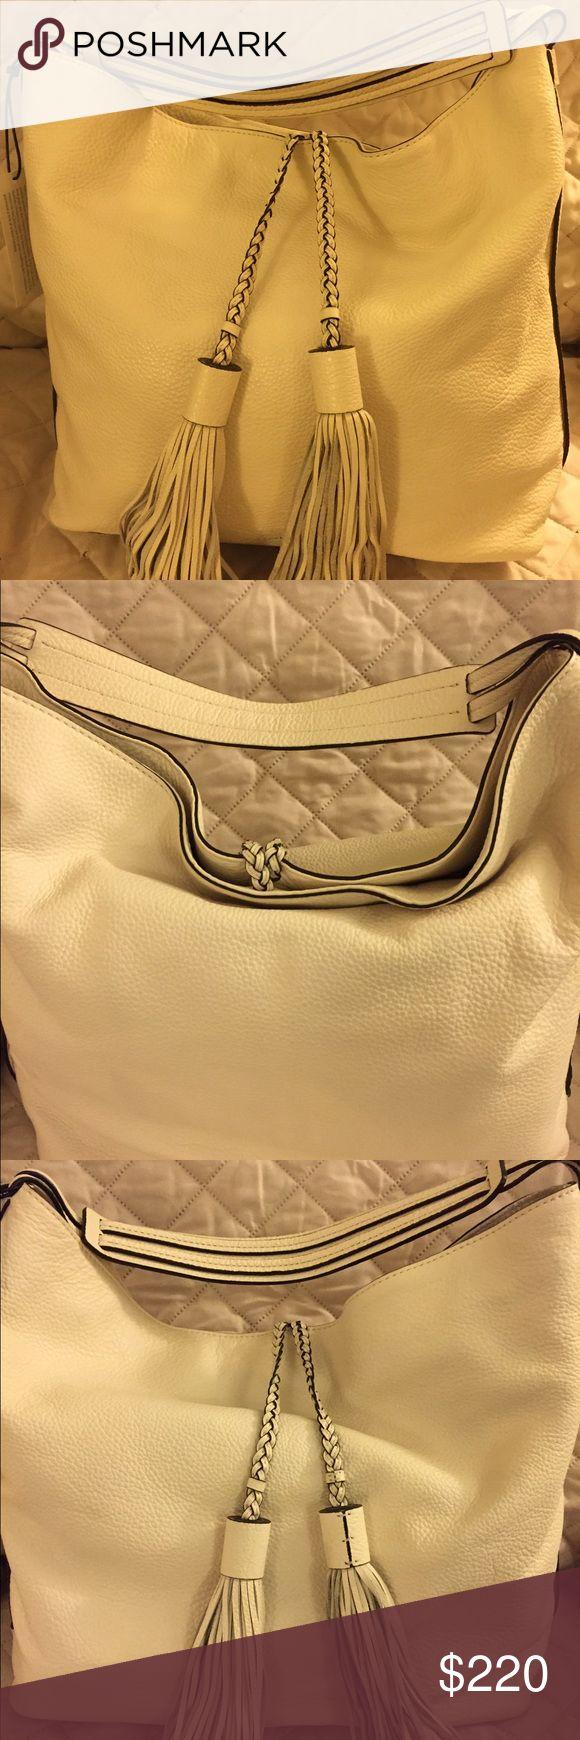 Rebecca Minkoff Isobel Hobo Shoulder Bag Rebecca Minkoff Isobel Hobo Shoulder Bag, antique white, lovely leather texture. Brand new. Magnetic closure on top. Rebecca Minkoff Bags Hobos